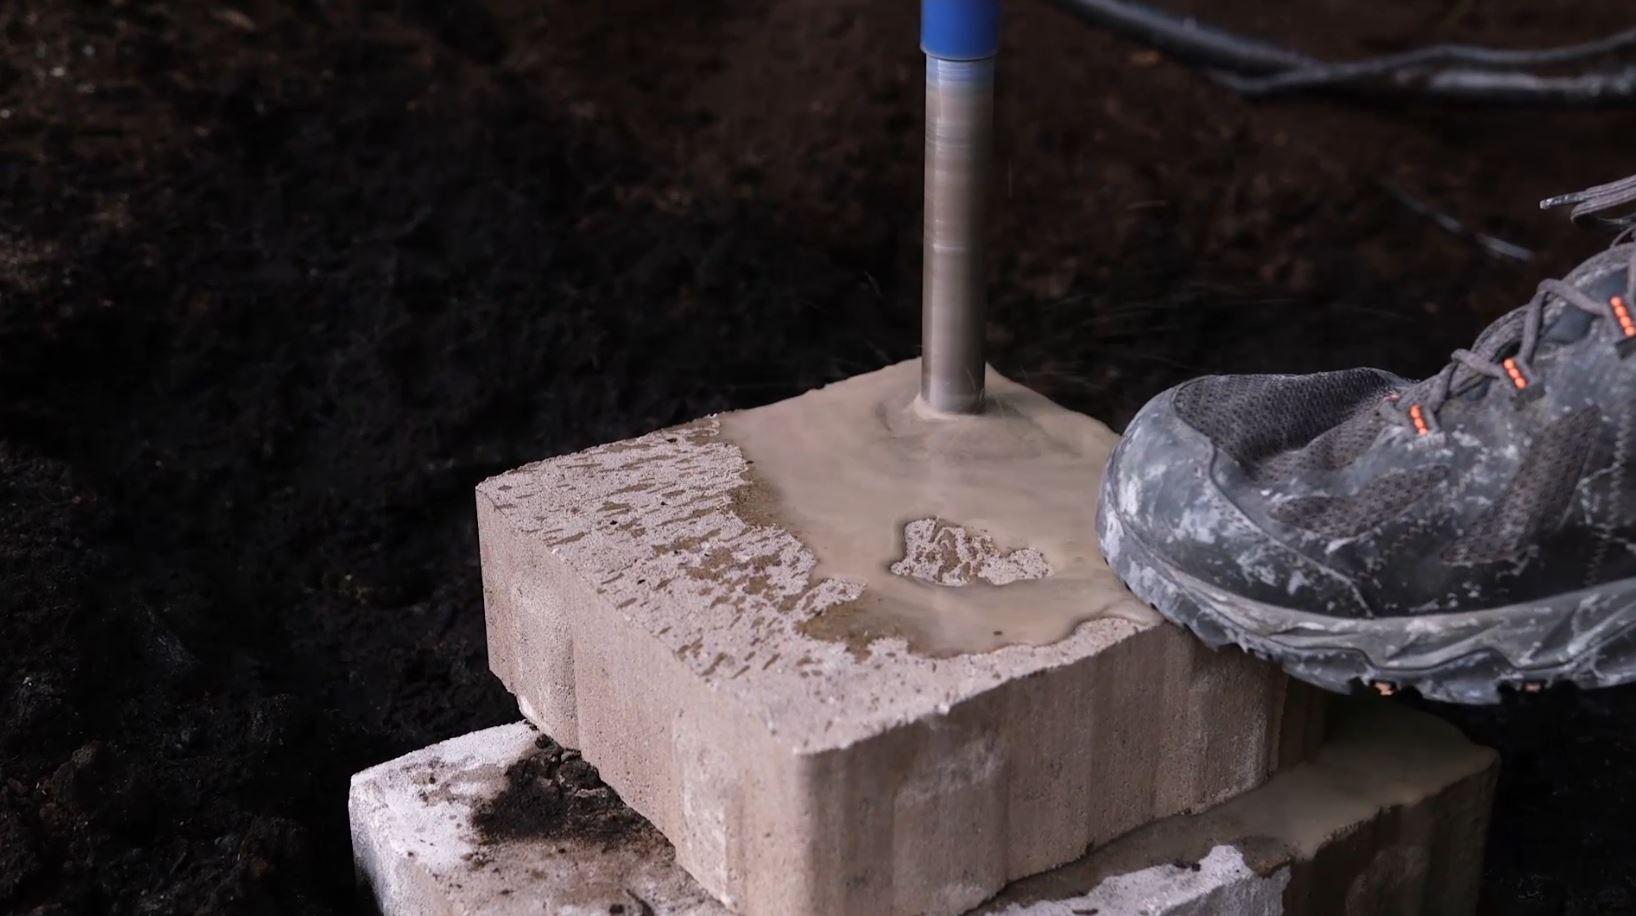 piercing a hole